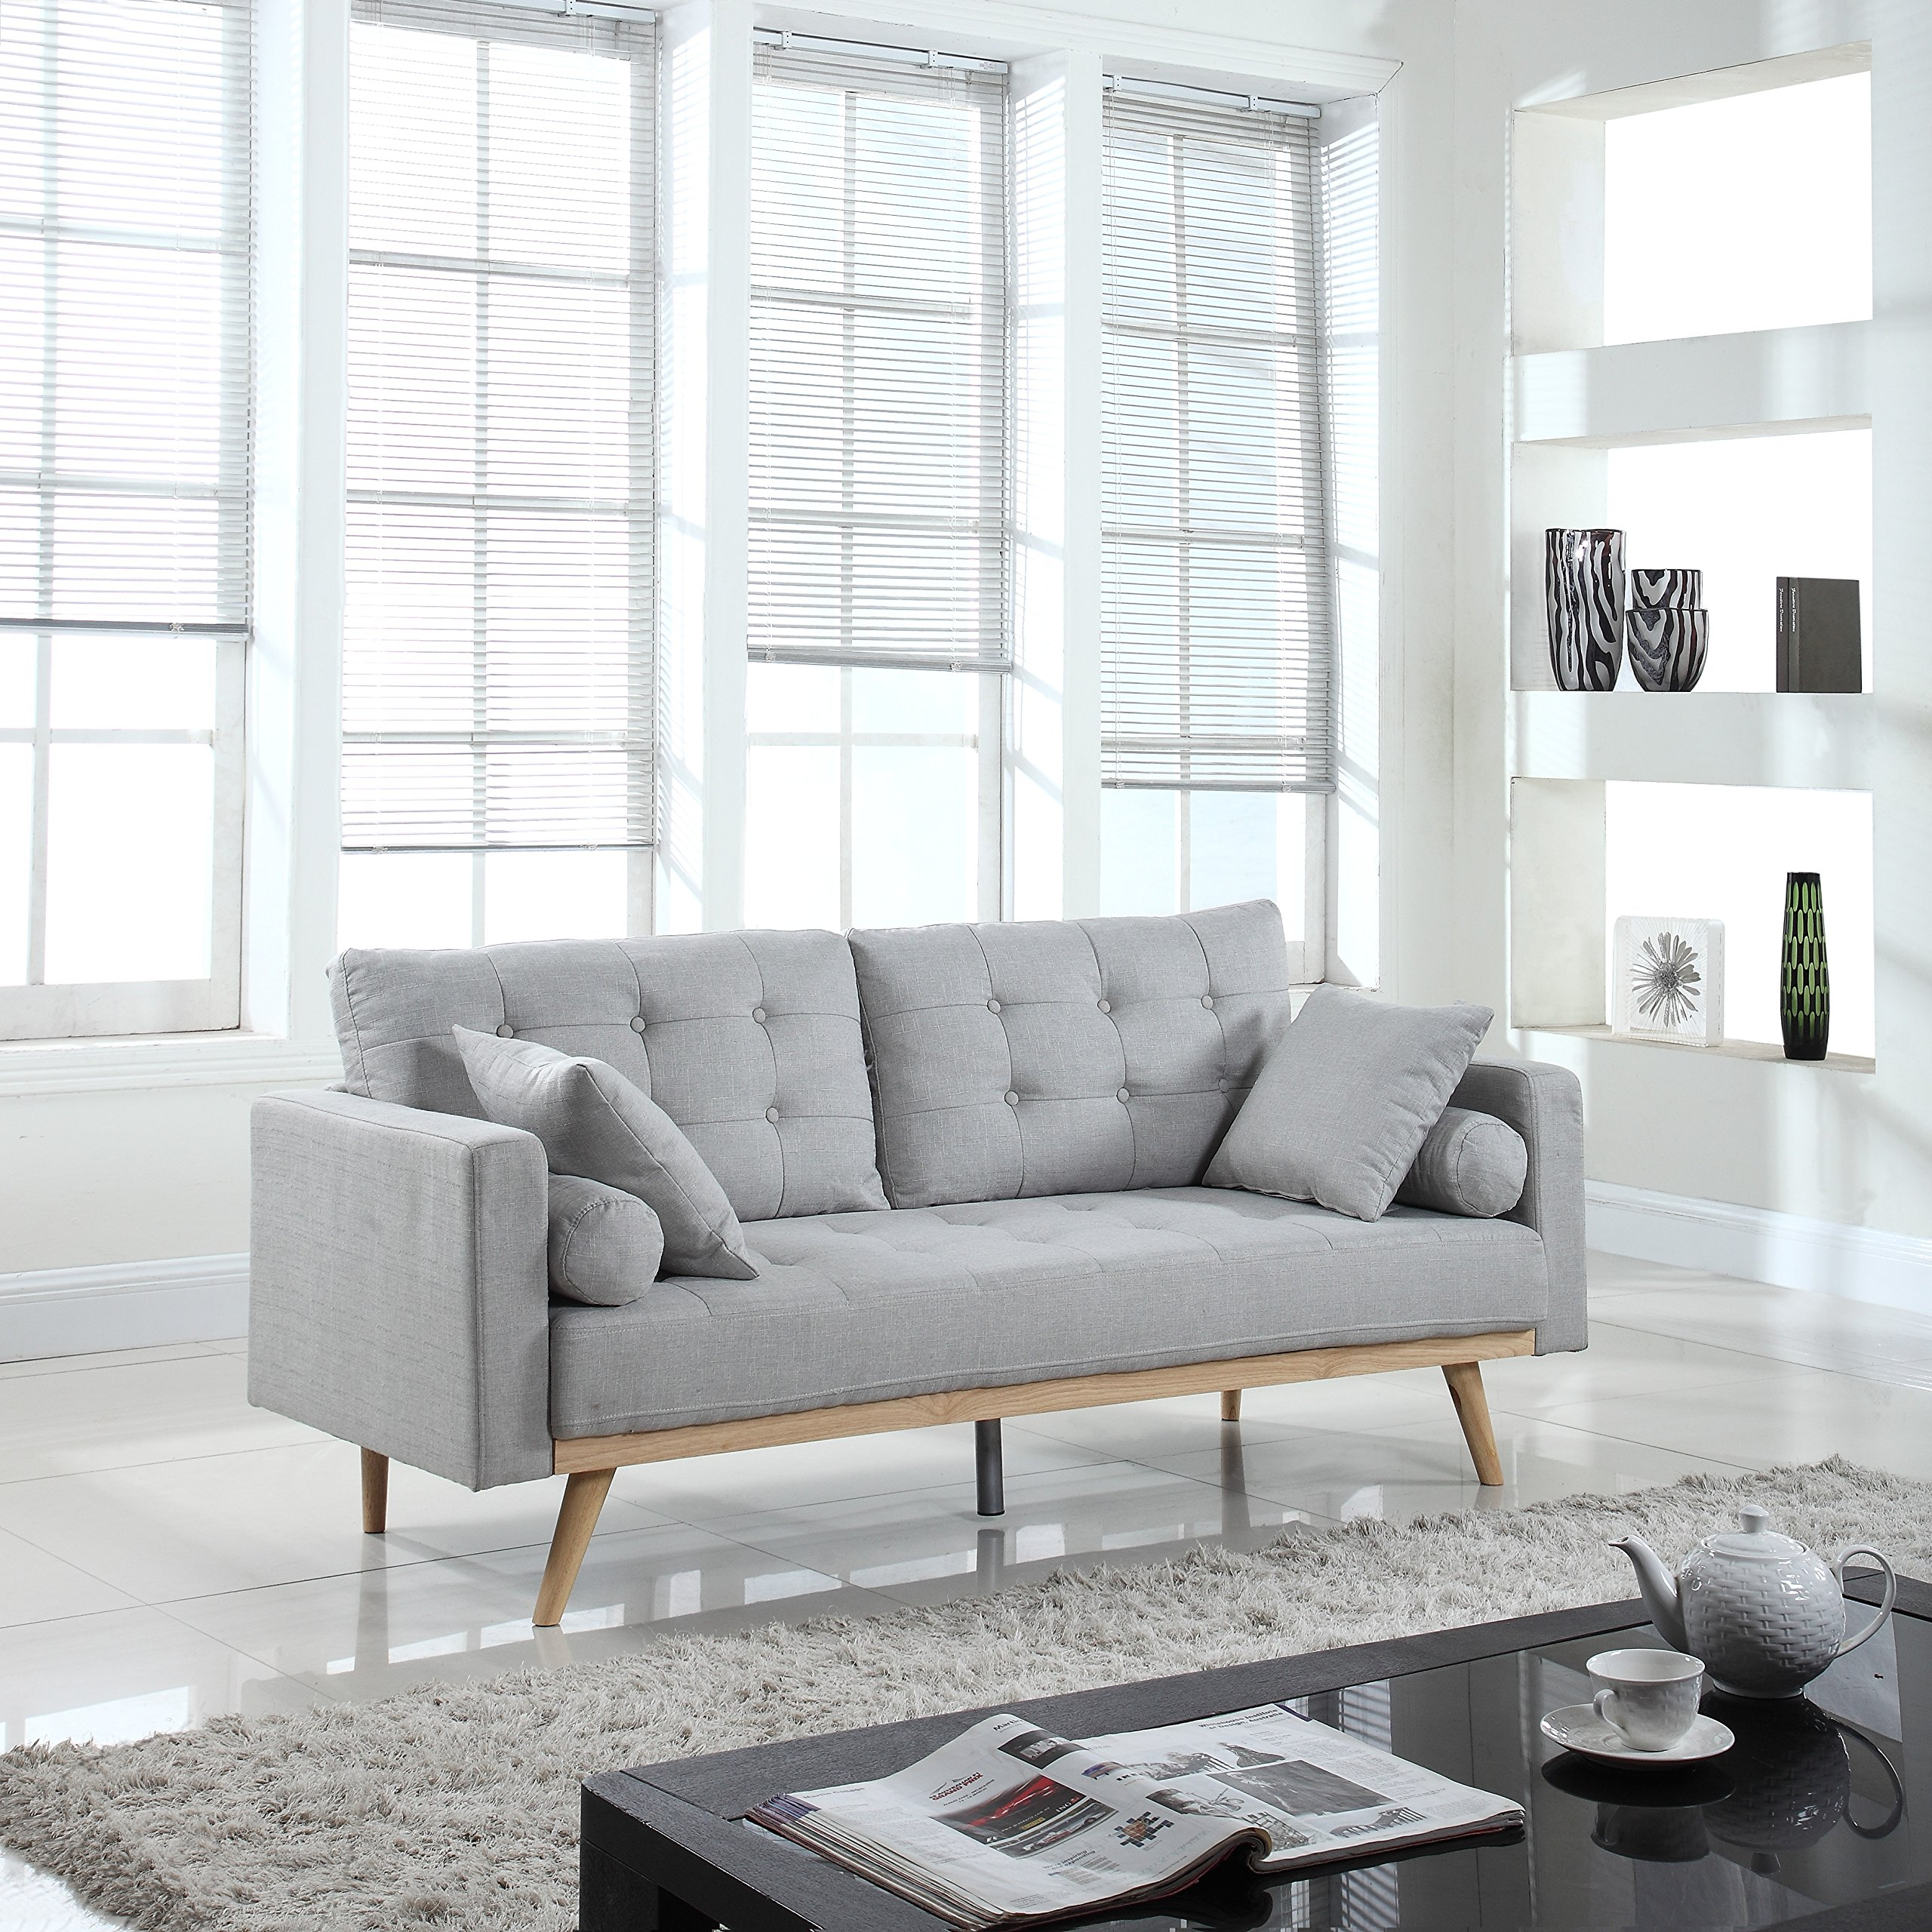 Divano Roma Furniture Mid Century Sofas Light Grey Lavorist